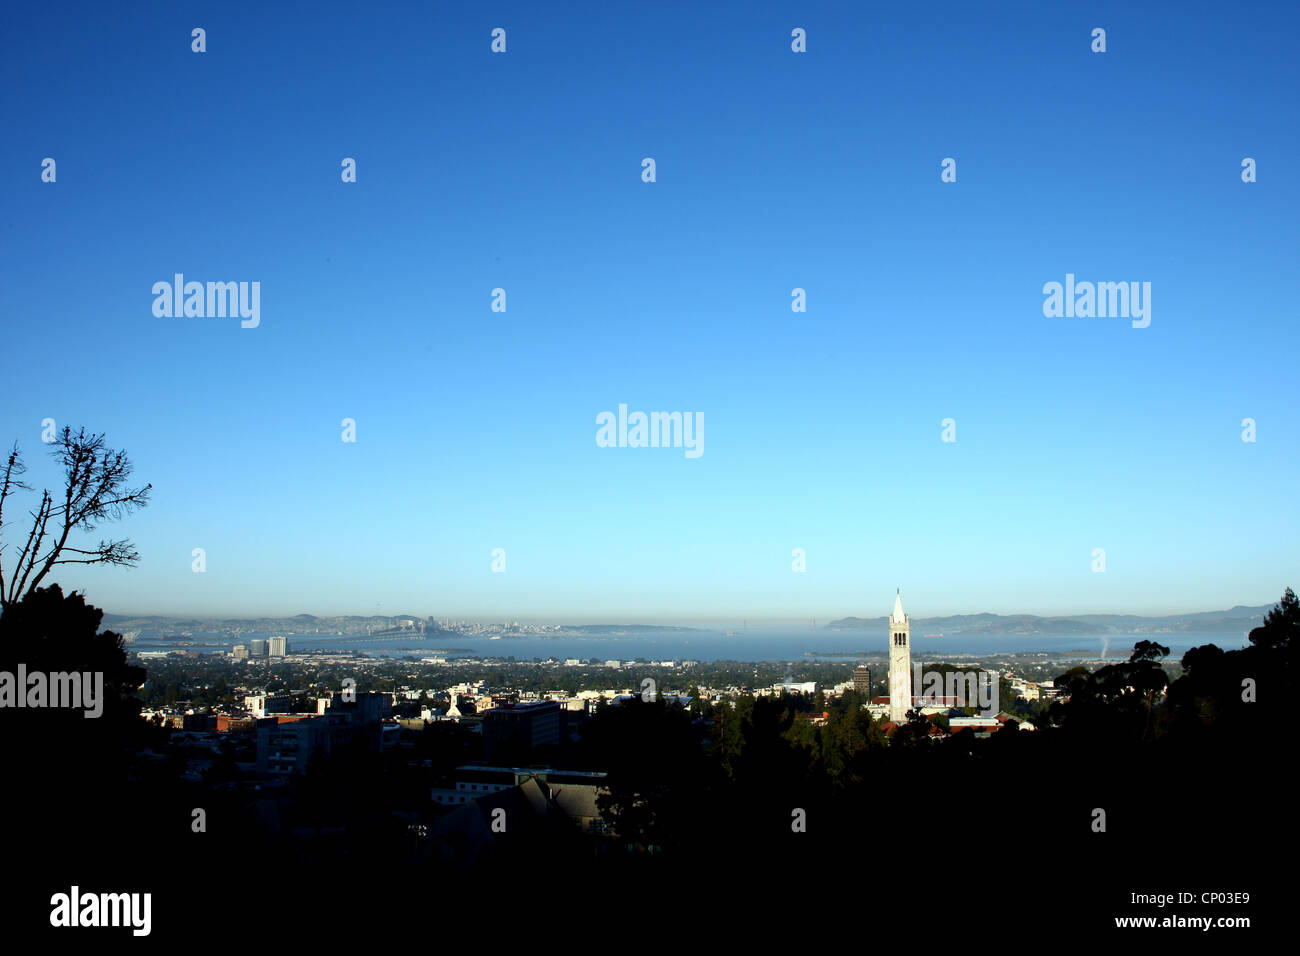 SATHER TOWER BERKELEY UNIVERSITY BERKELEY UNIVERSITY OF CALIFORNIA USA 06 October 2011 - Stock Image